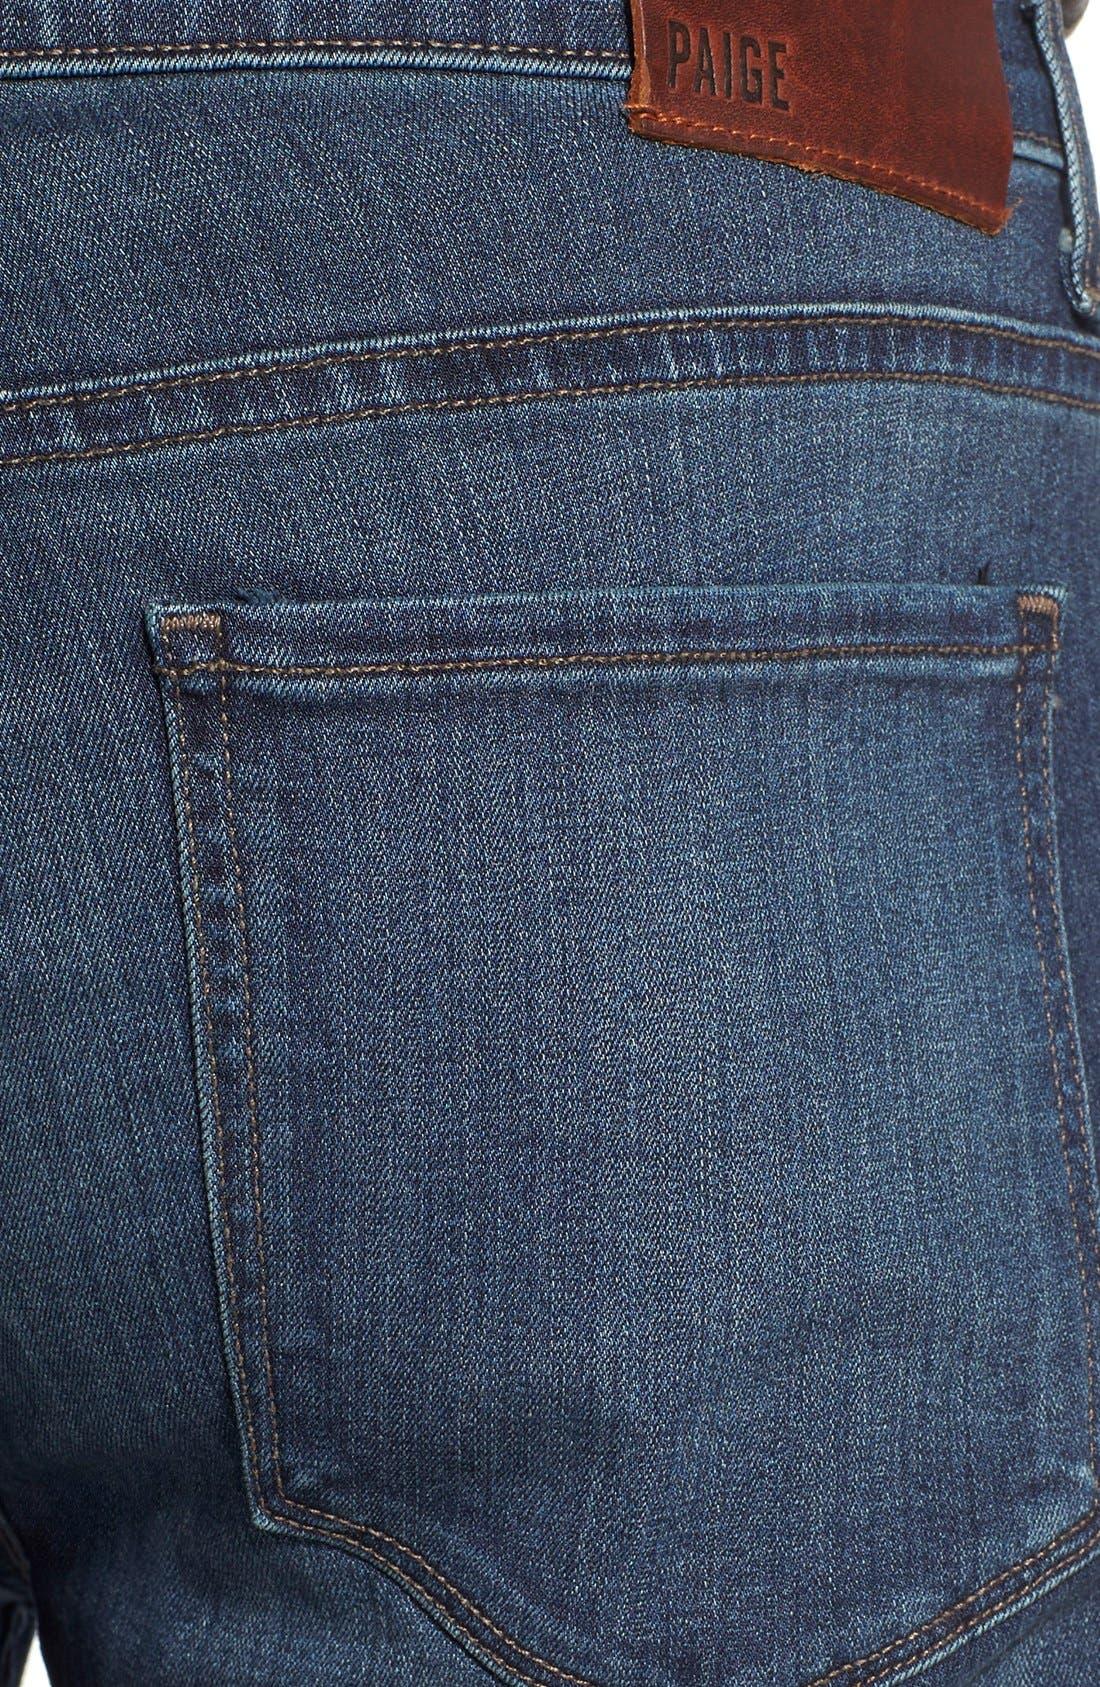 Alternate Image 4  - PAIGE 'Federal' Slim Straight Leg Jeans (Blakely)